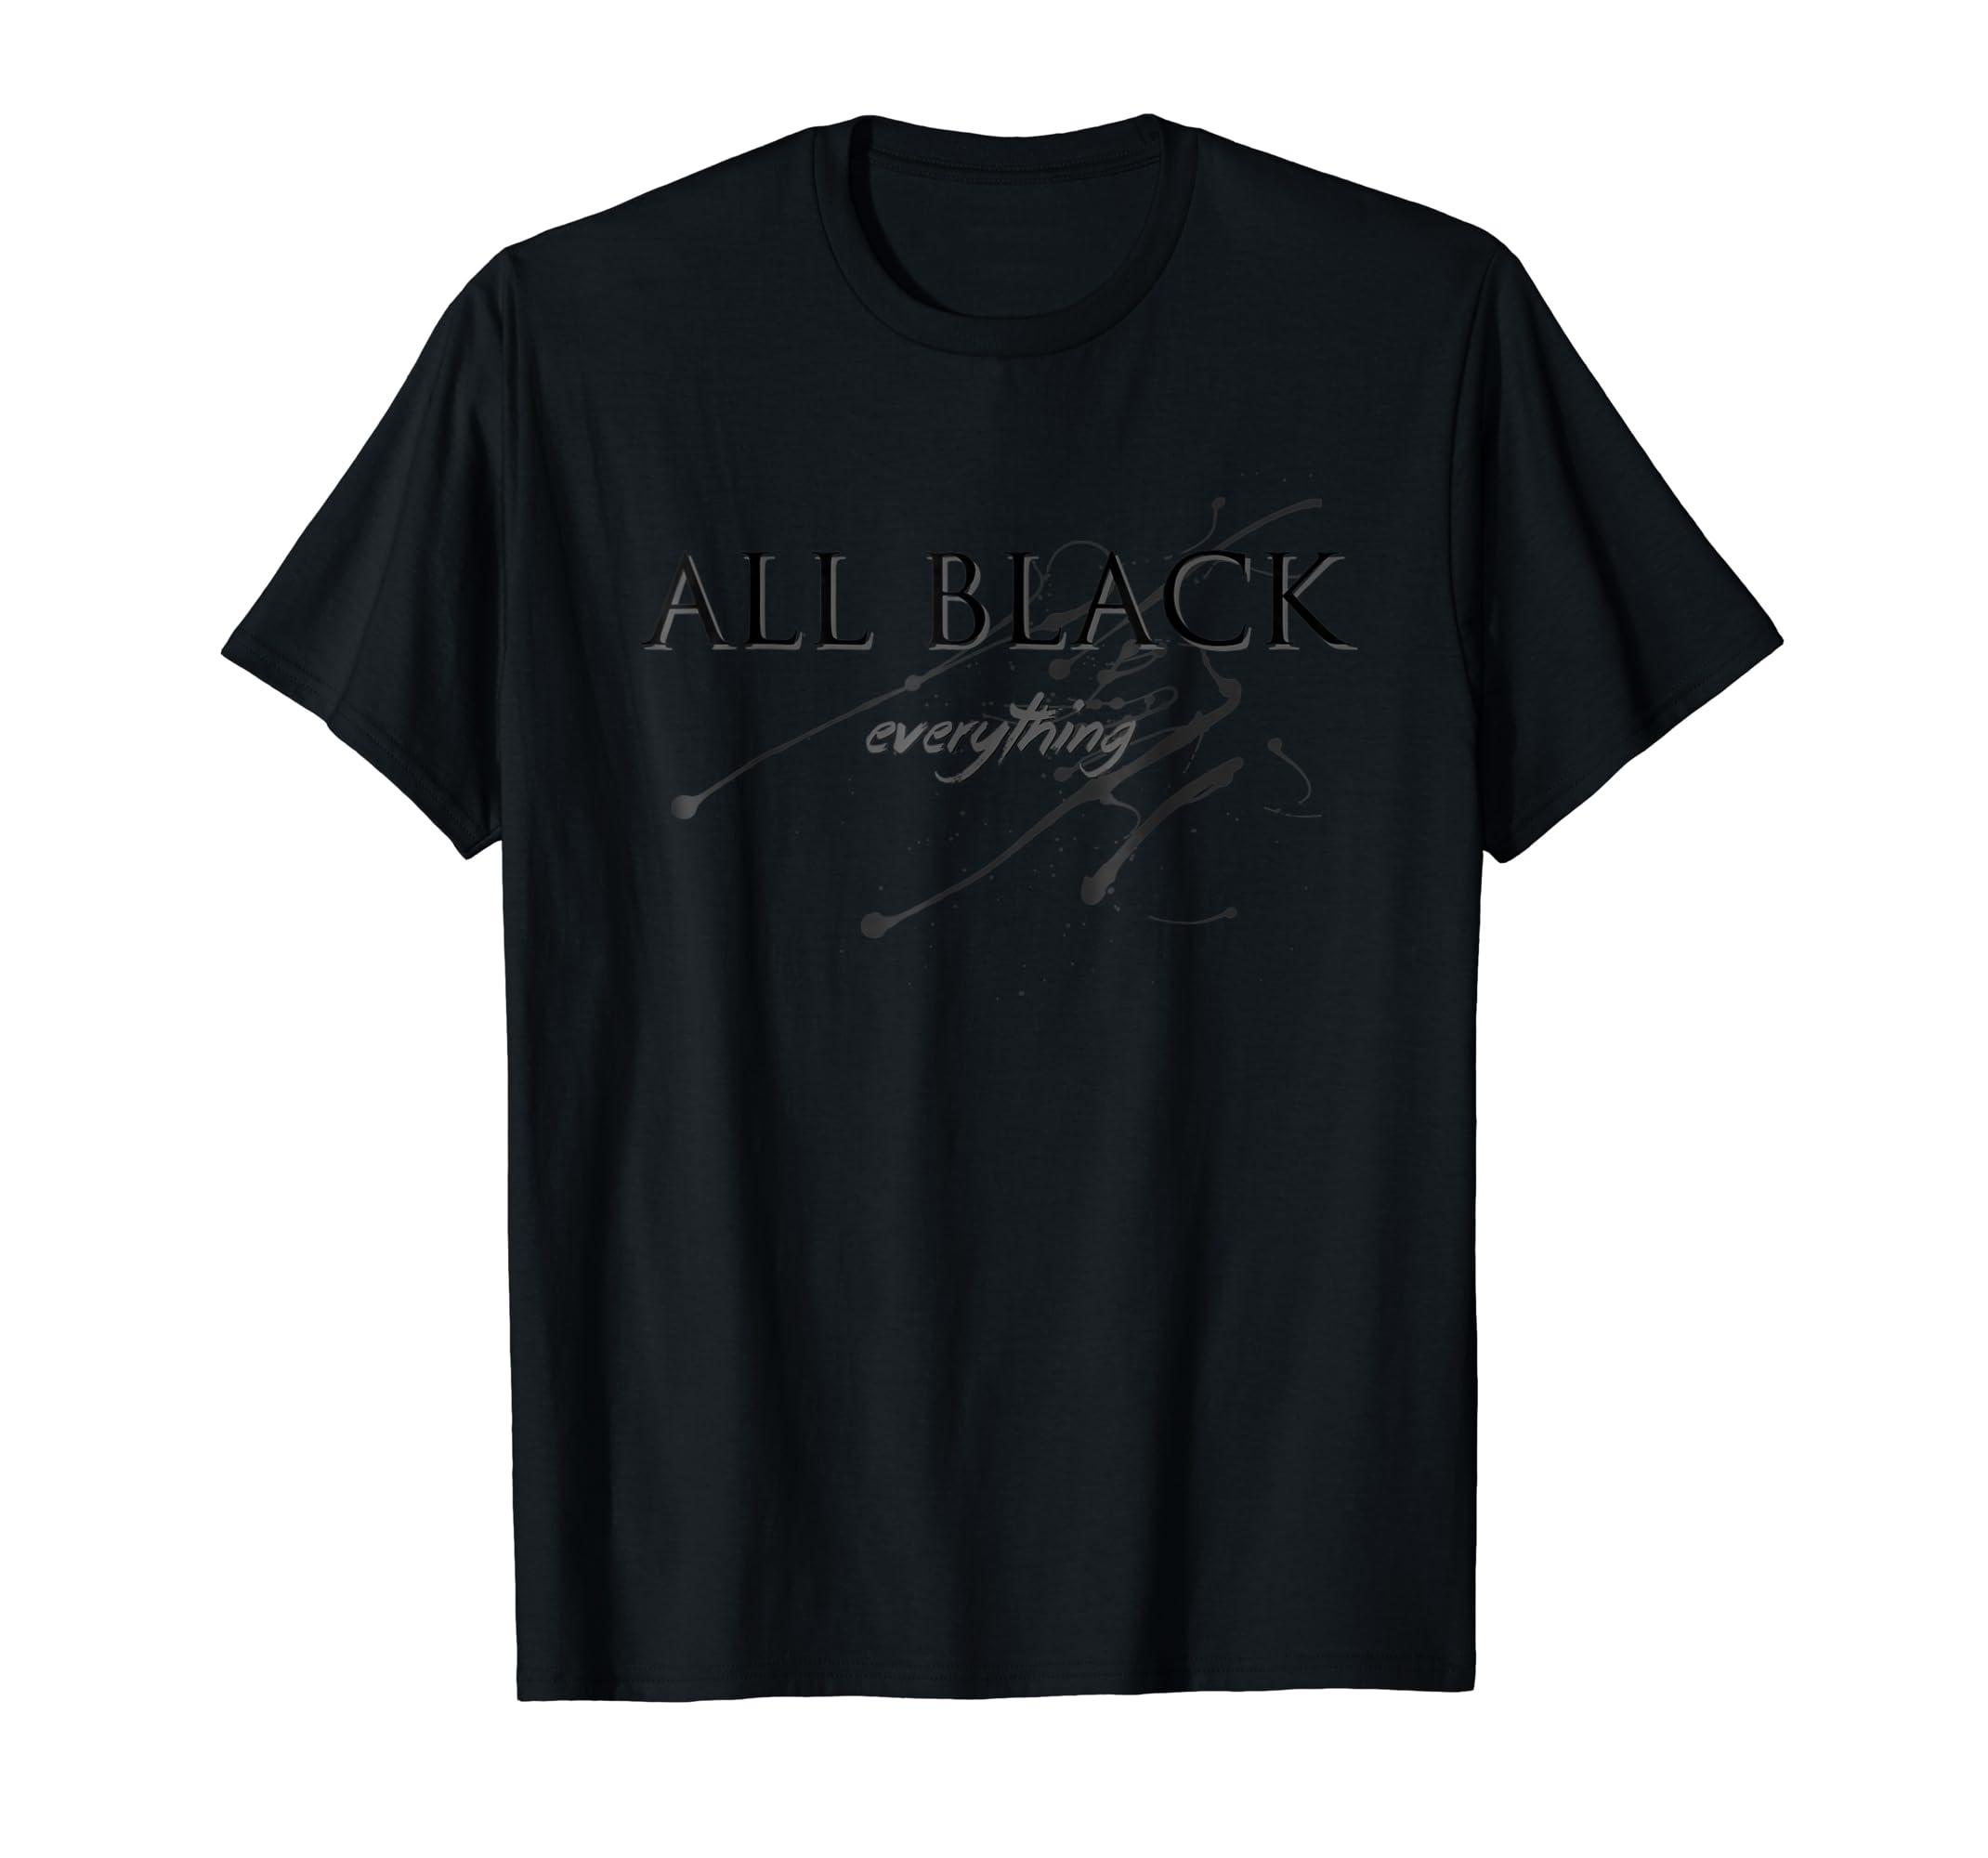 5a0167e40 Amazon.com: All Black Everything T-shirt: Clothing